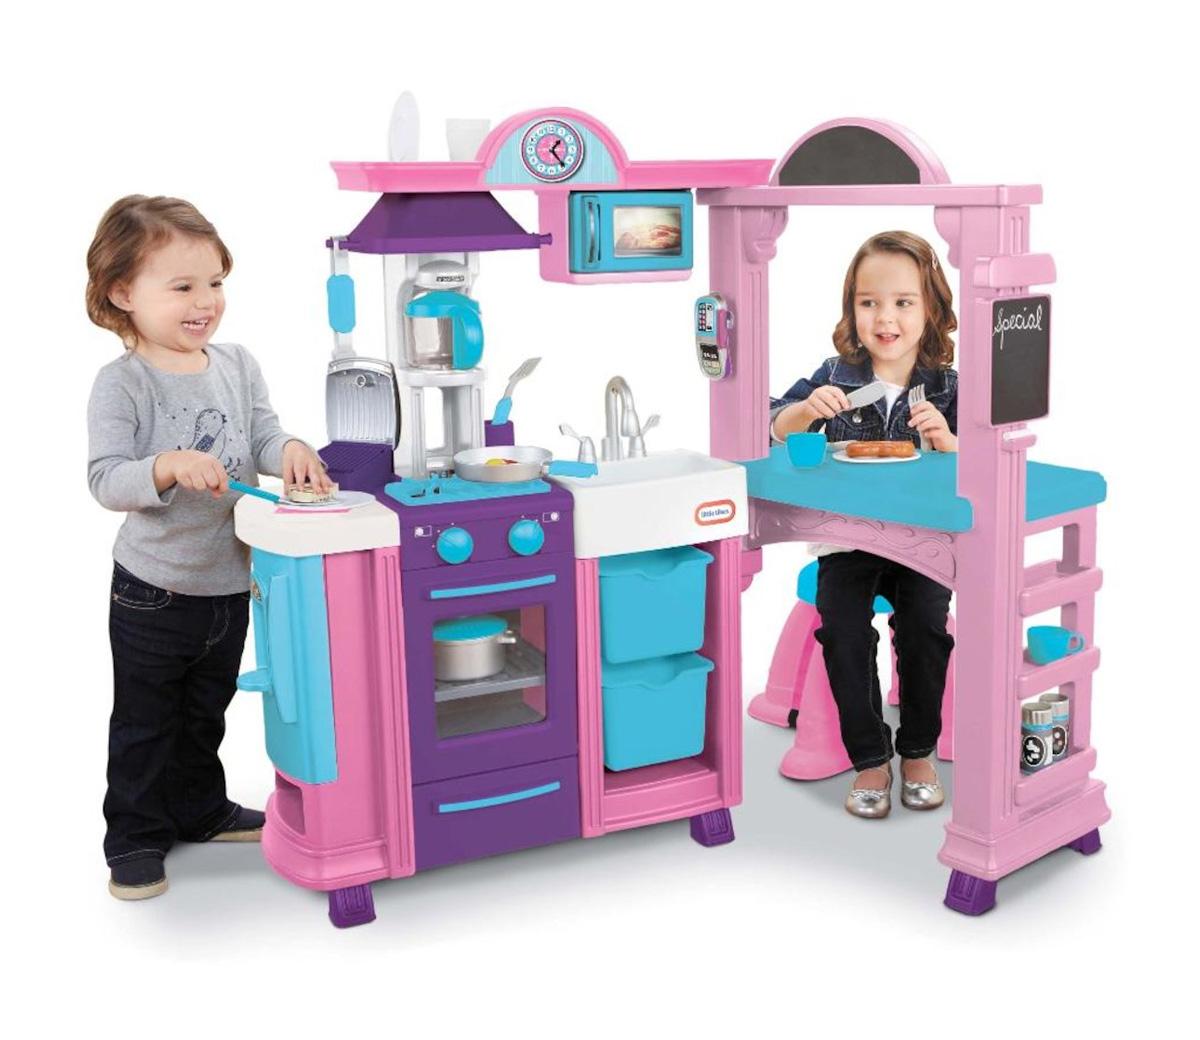 tikes kitchen restaurant pink. Black Bedroom Furniture Sets. Home Design Ideas